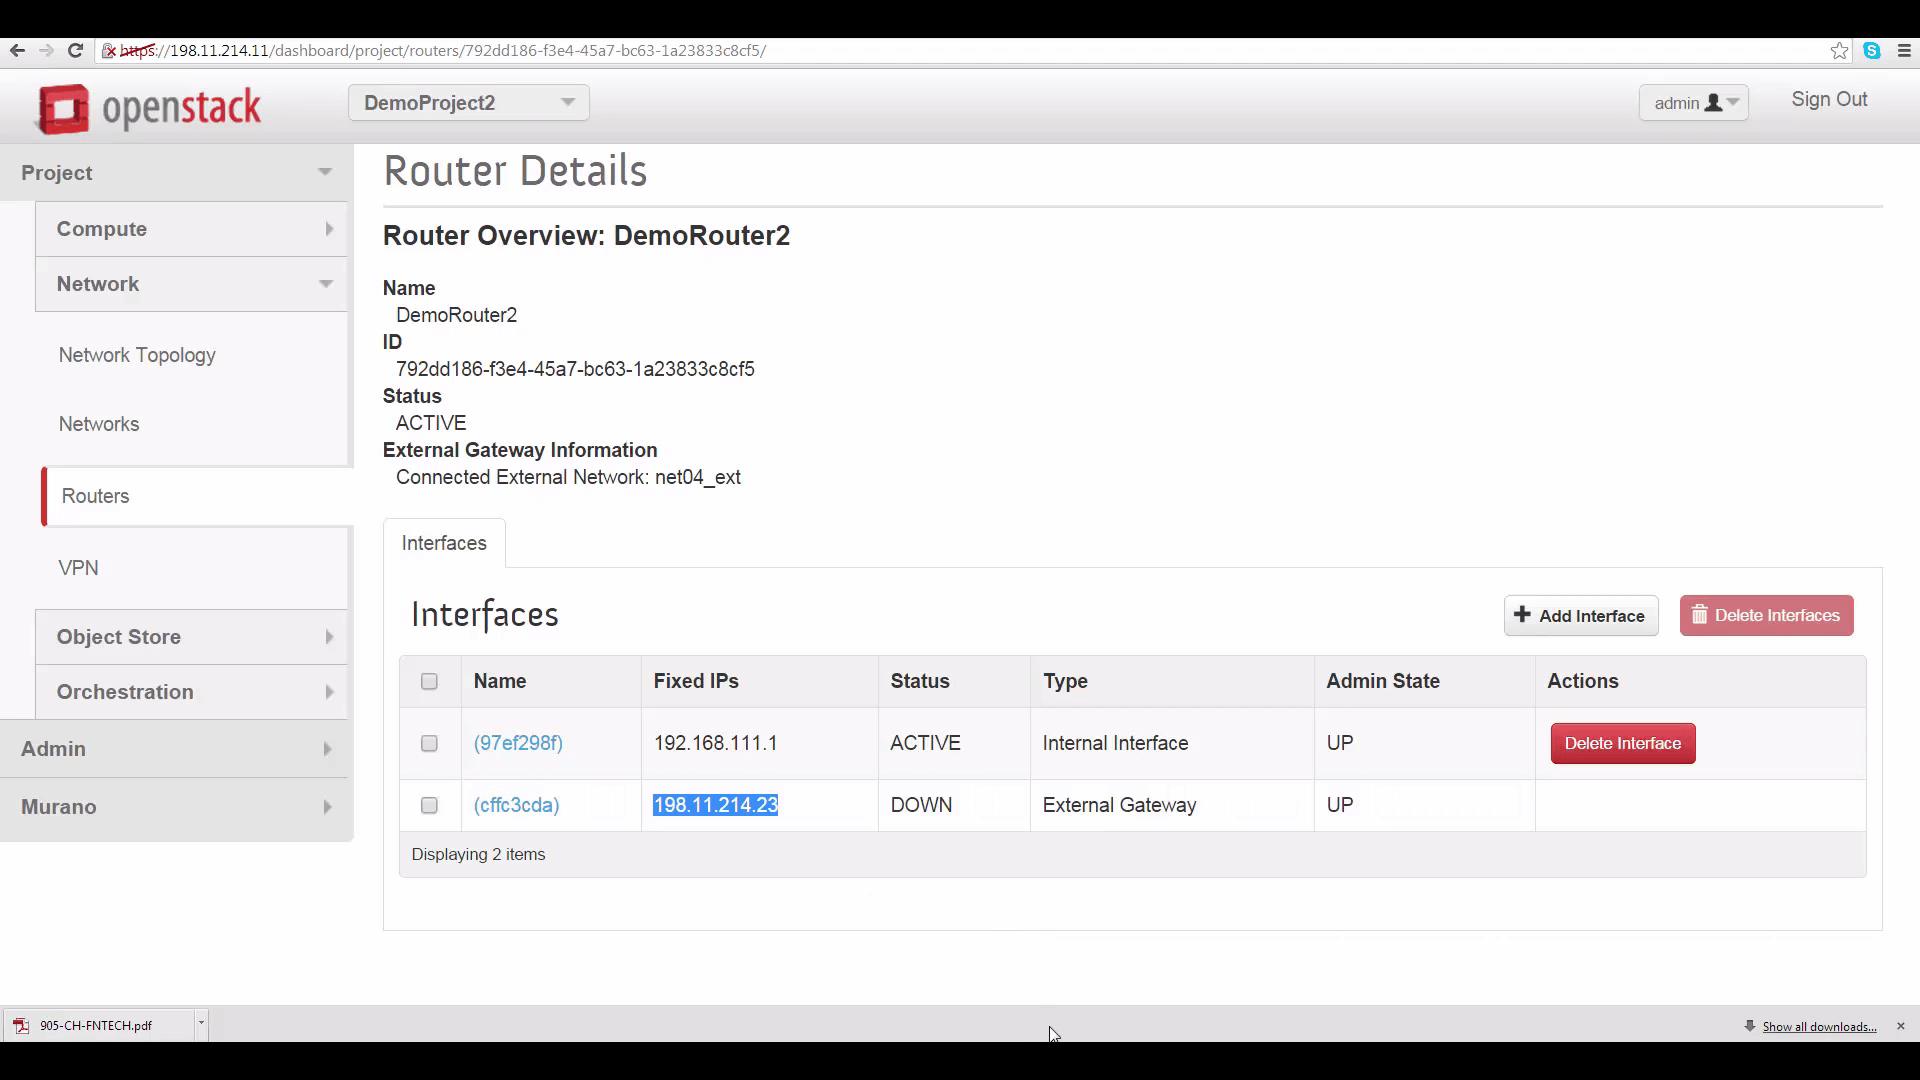 screenshot of Router Details for DemoProject2/Cloud B